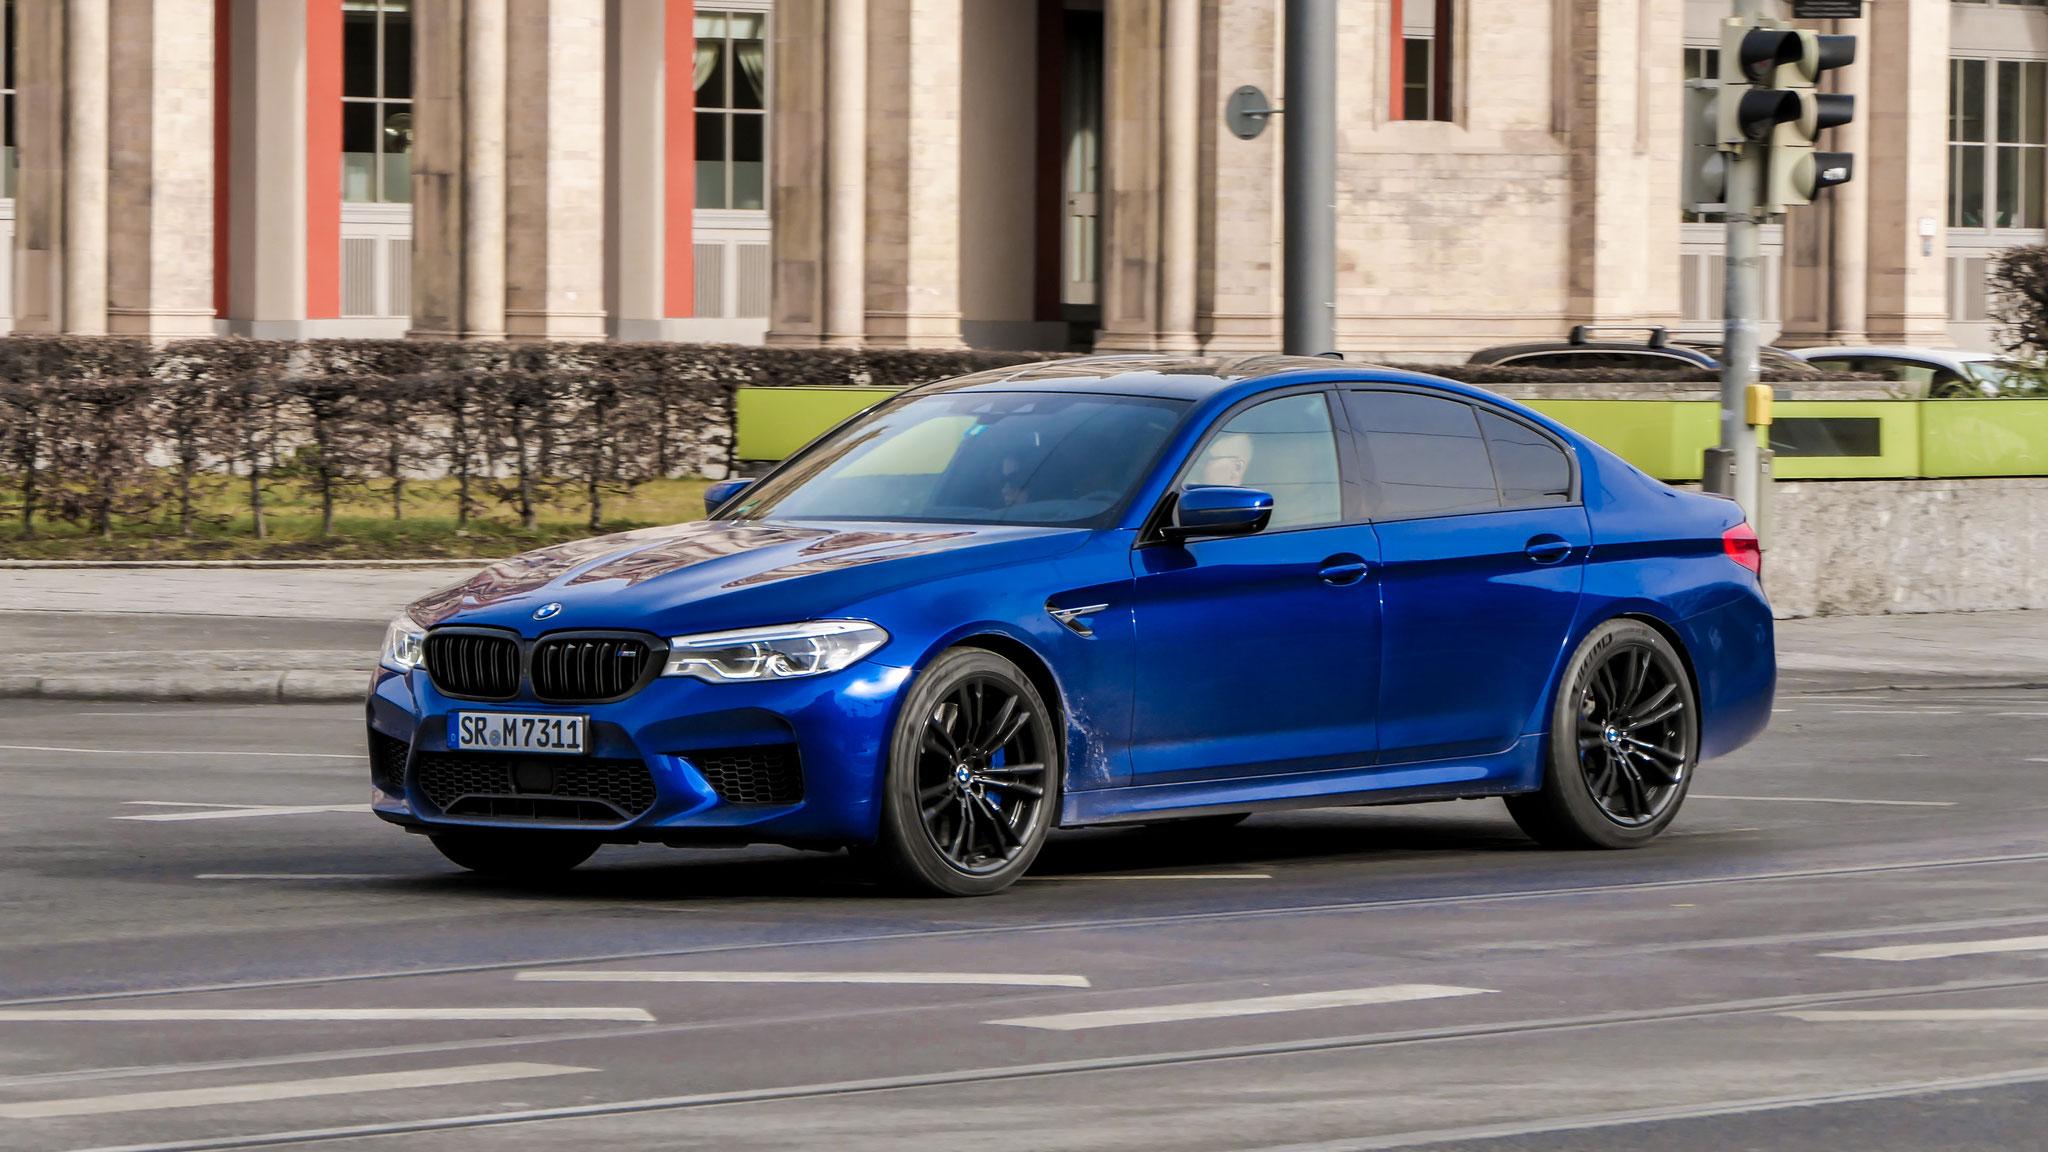 BMW M5 - SR-M-7311